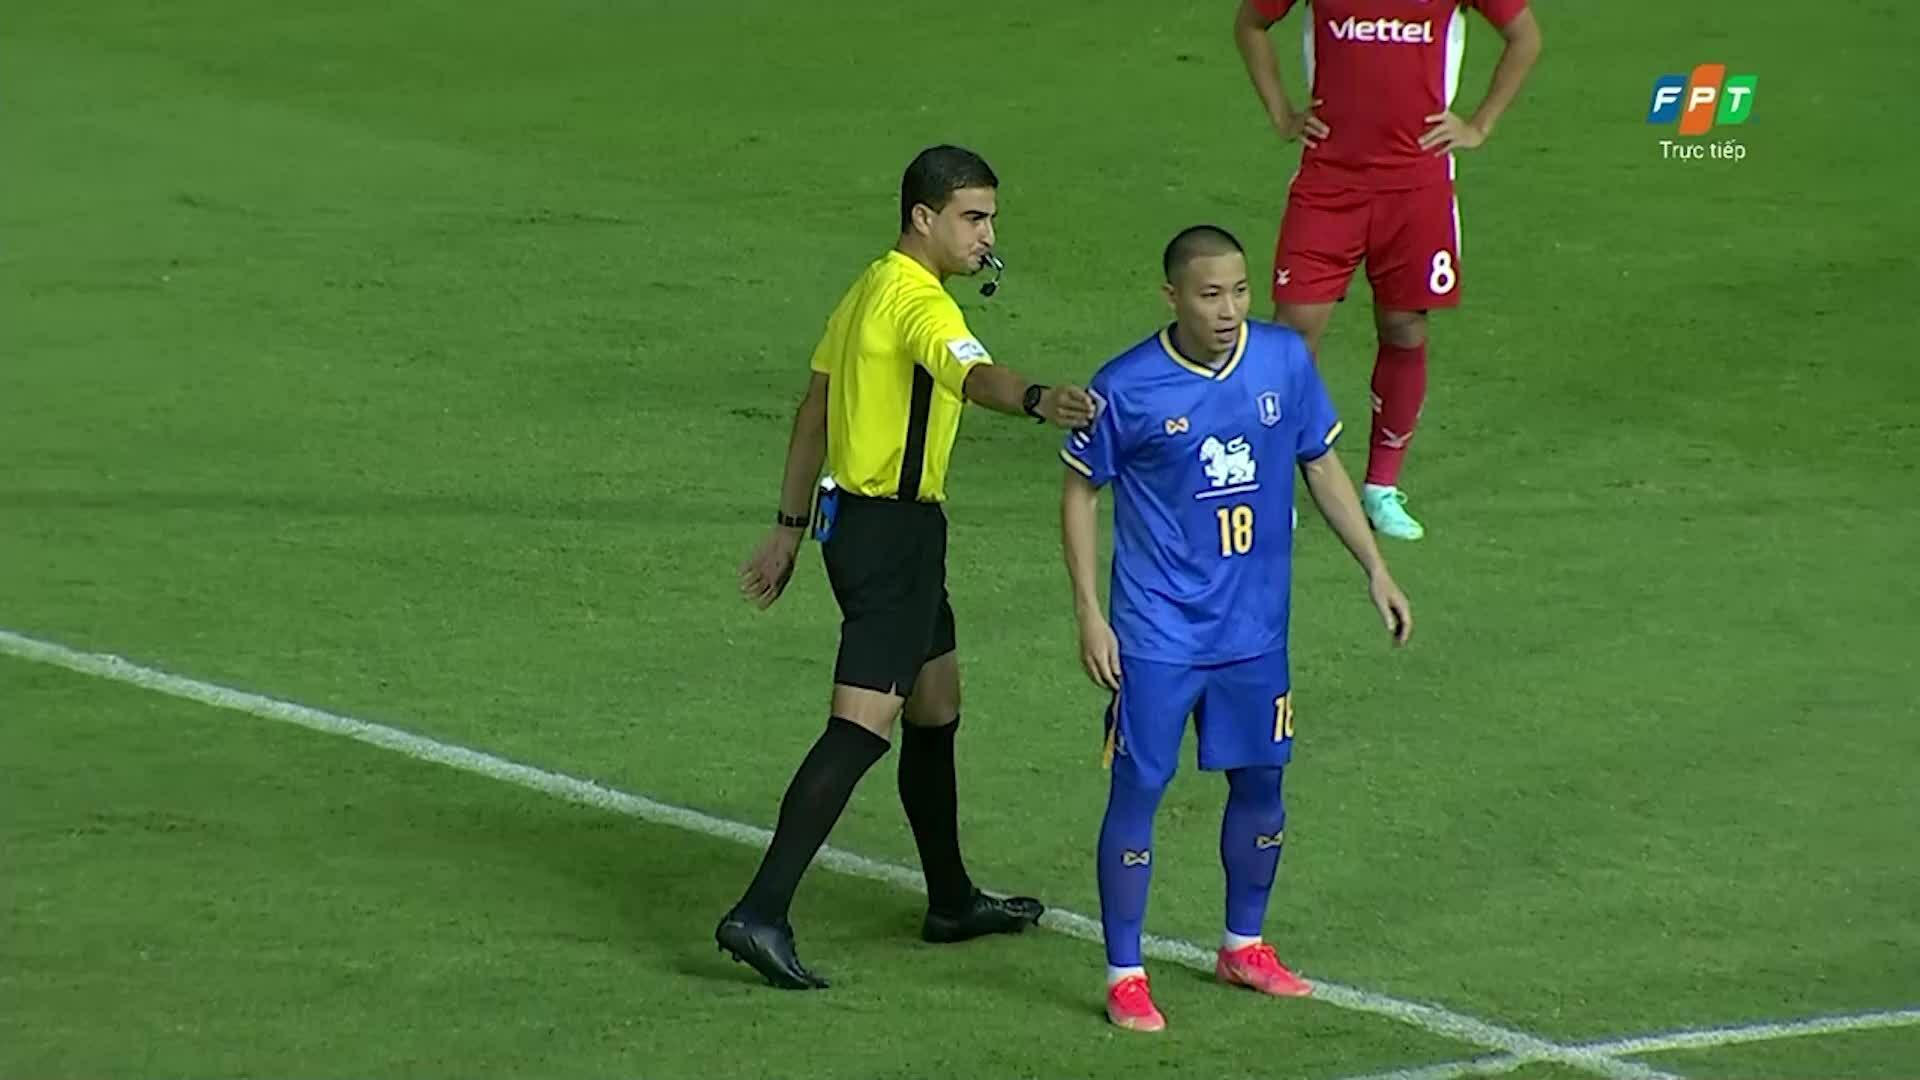 BG Pathum United 2-0 Viettel